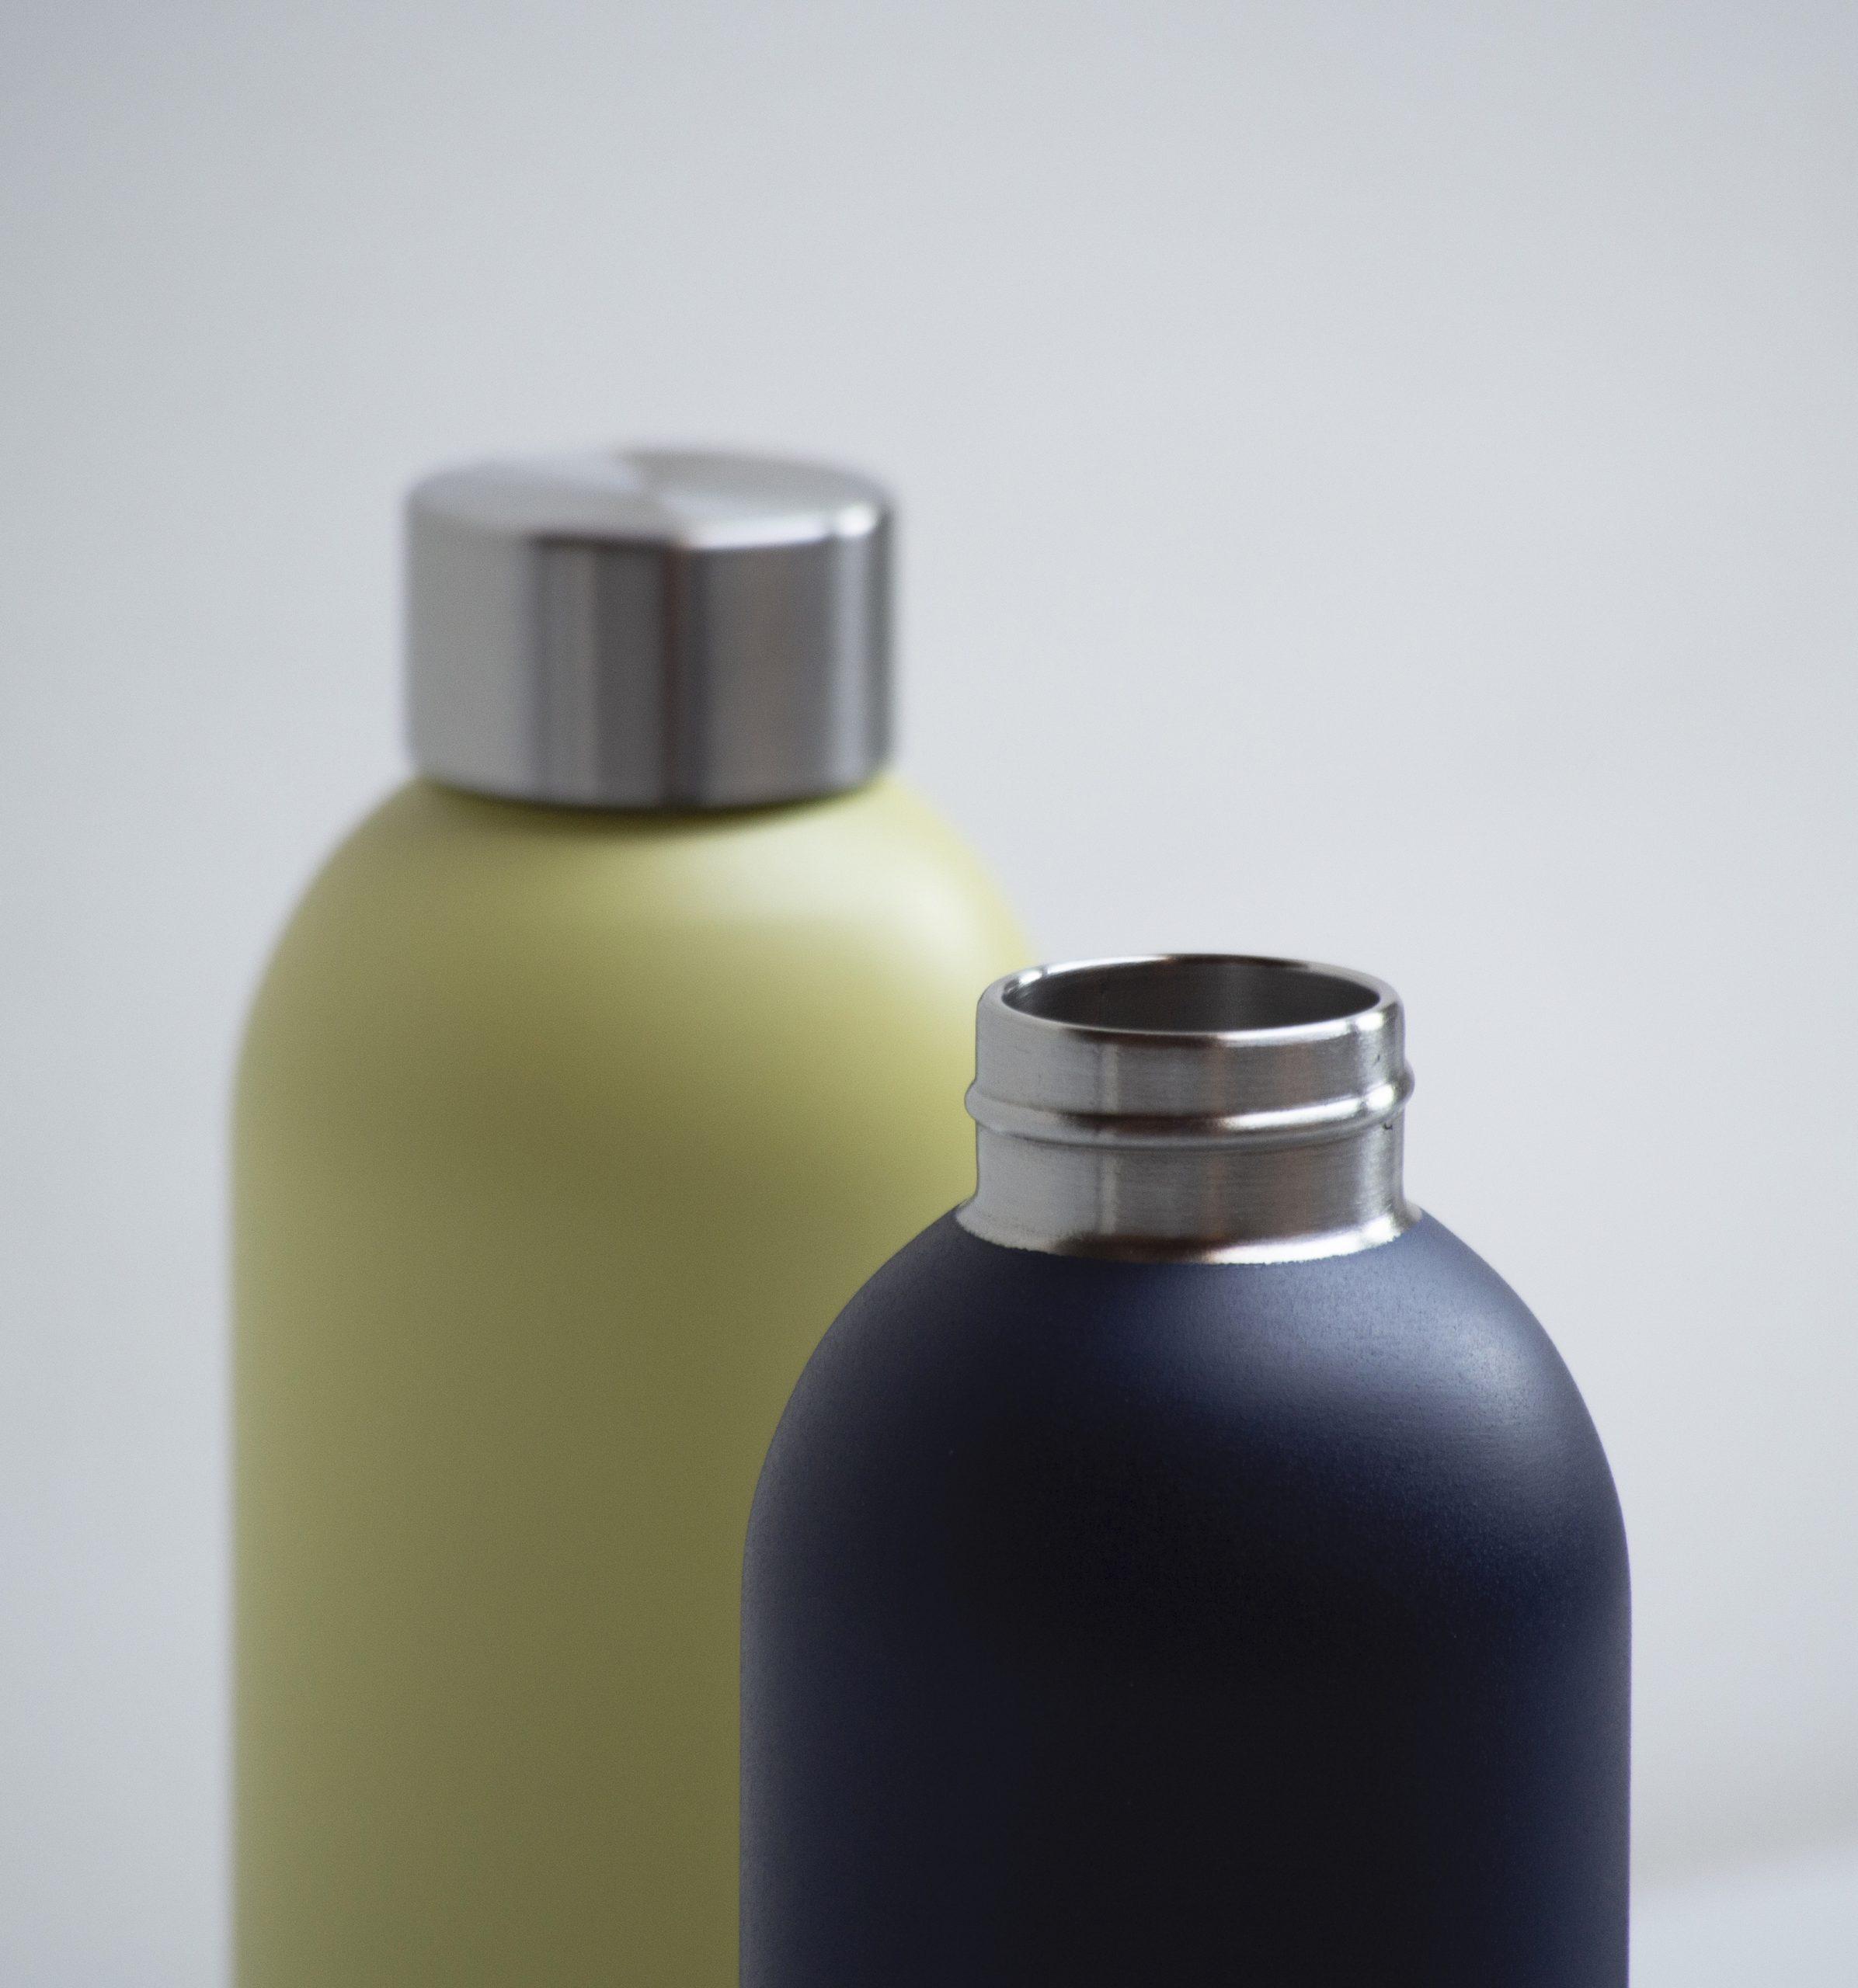 Detail of Keep Cool reusable bottle by Debiasi Sandri for Stelton